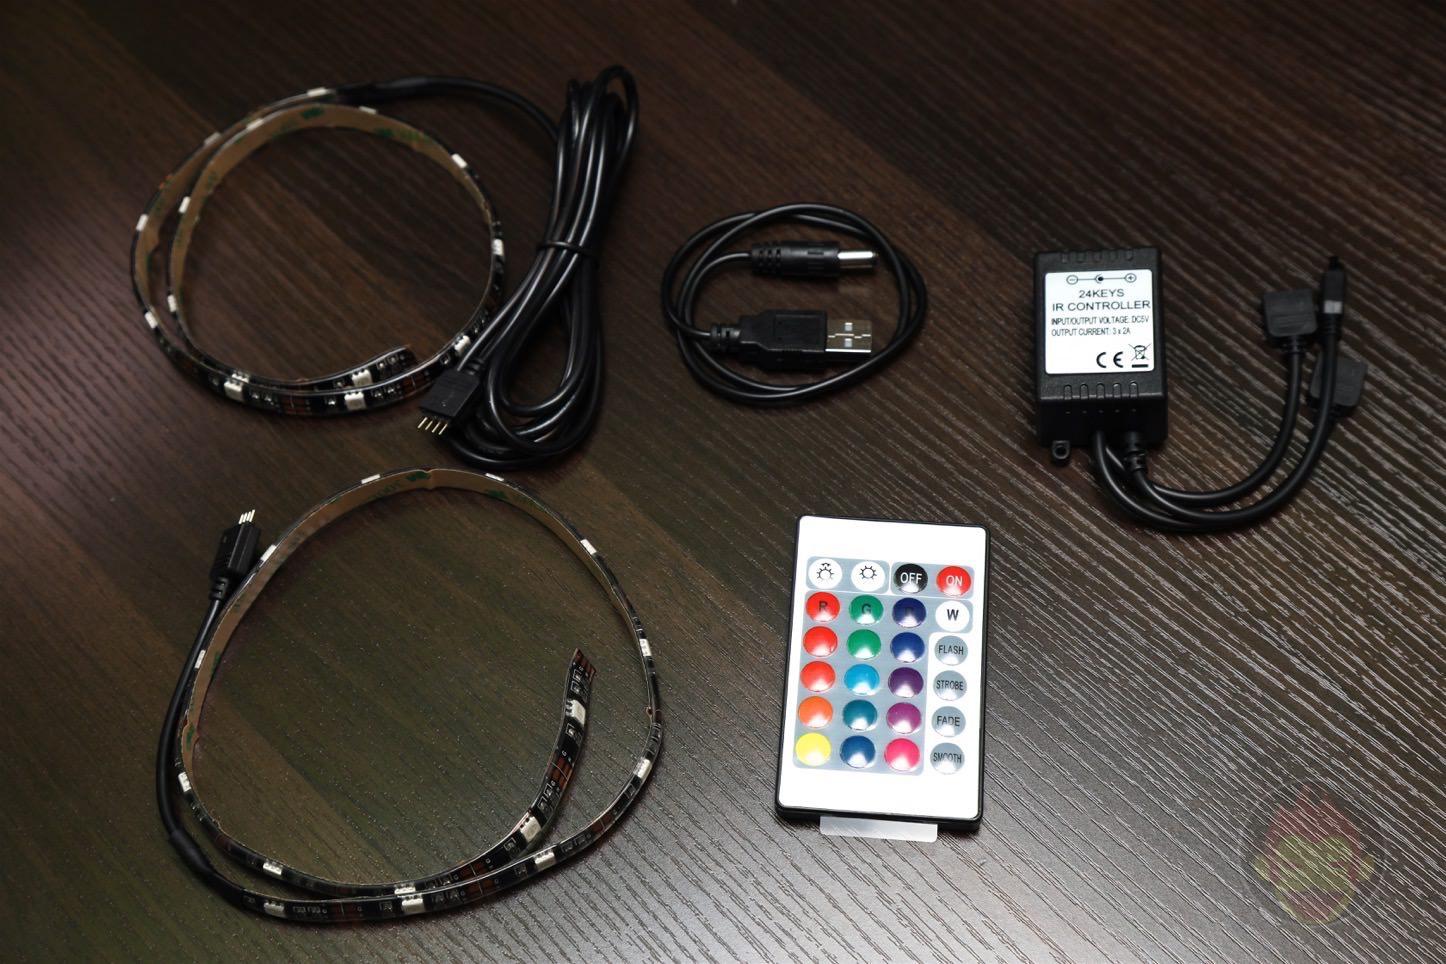 RioRand LEDテープライトでMac環境に間接照明を追加